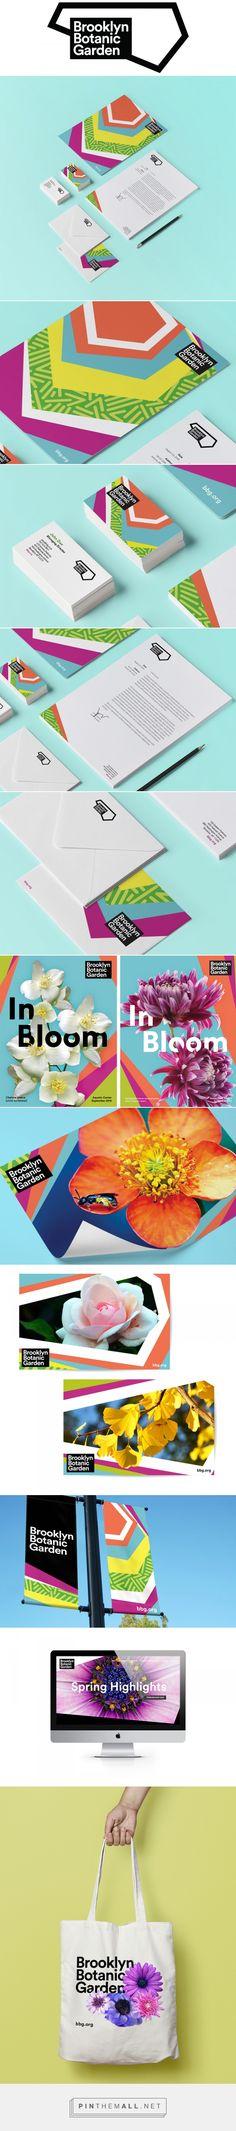 Brooklyn Botanic Garden on Behance | Fivestar Branding – Design and Branding…